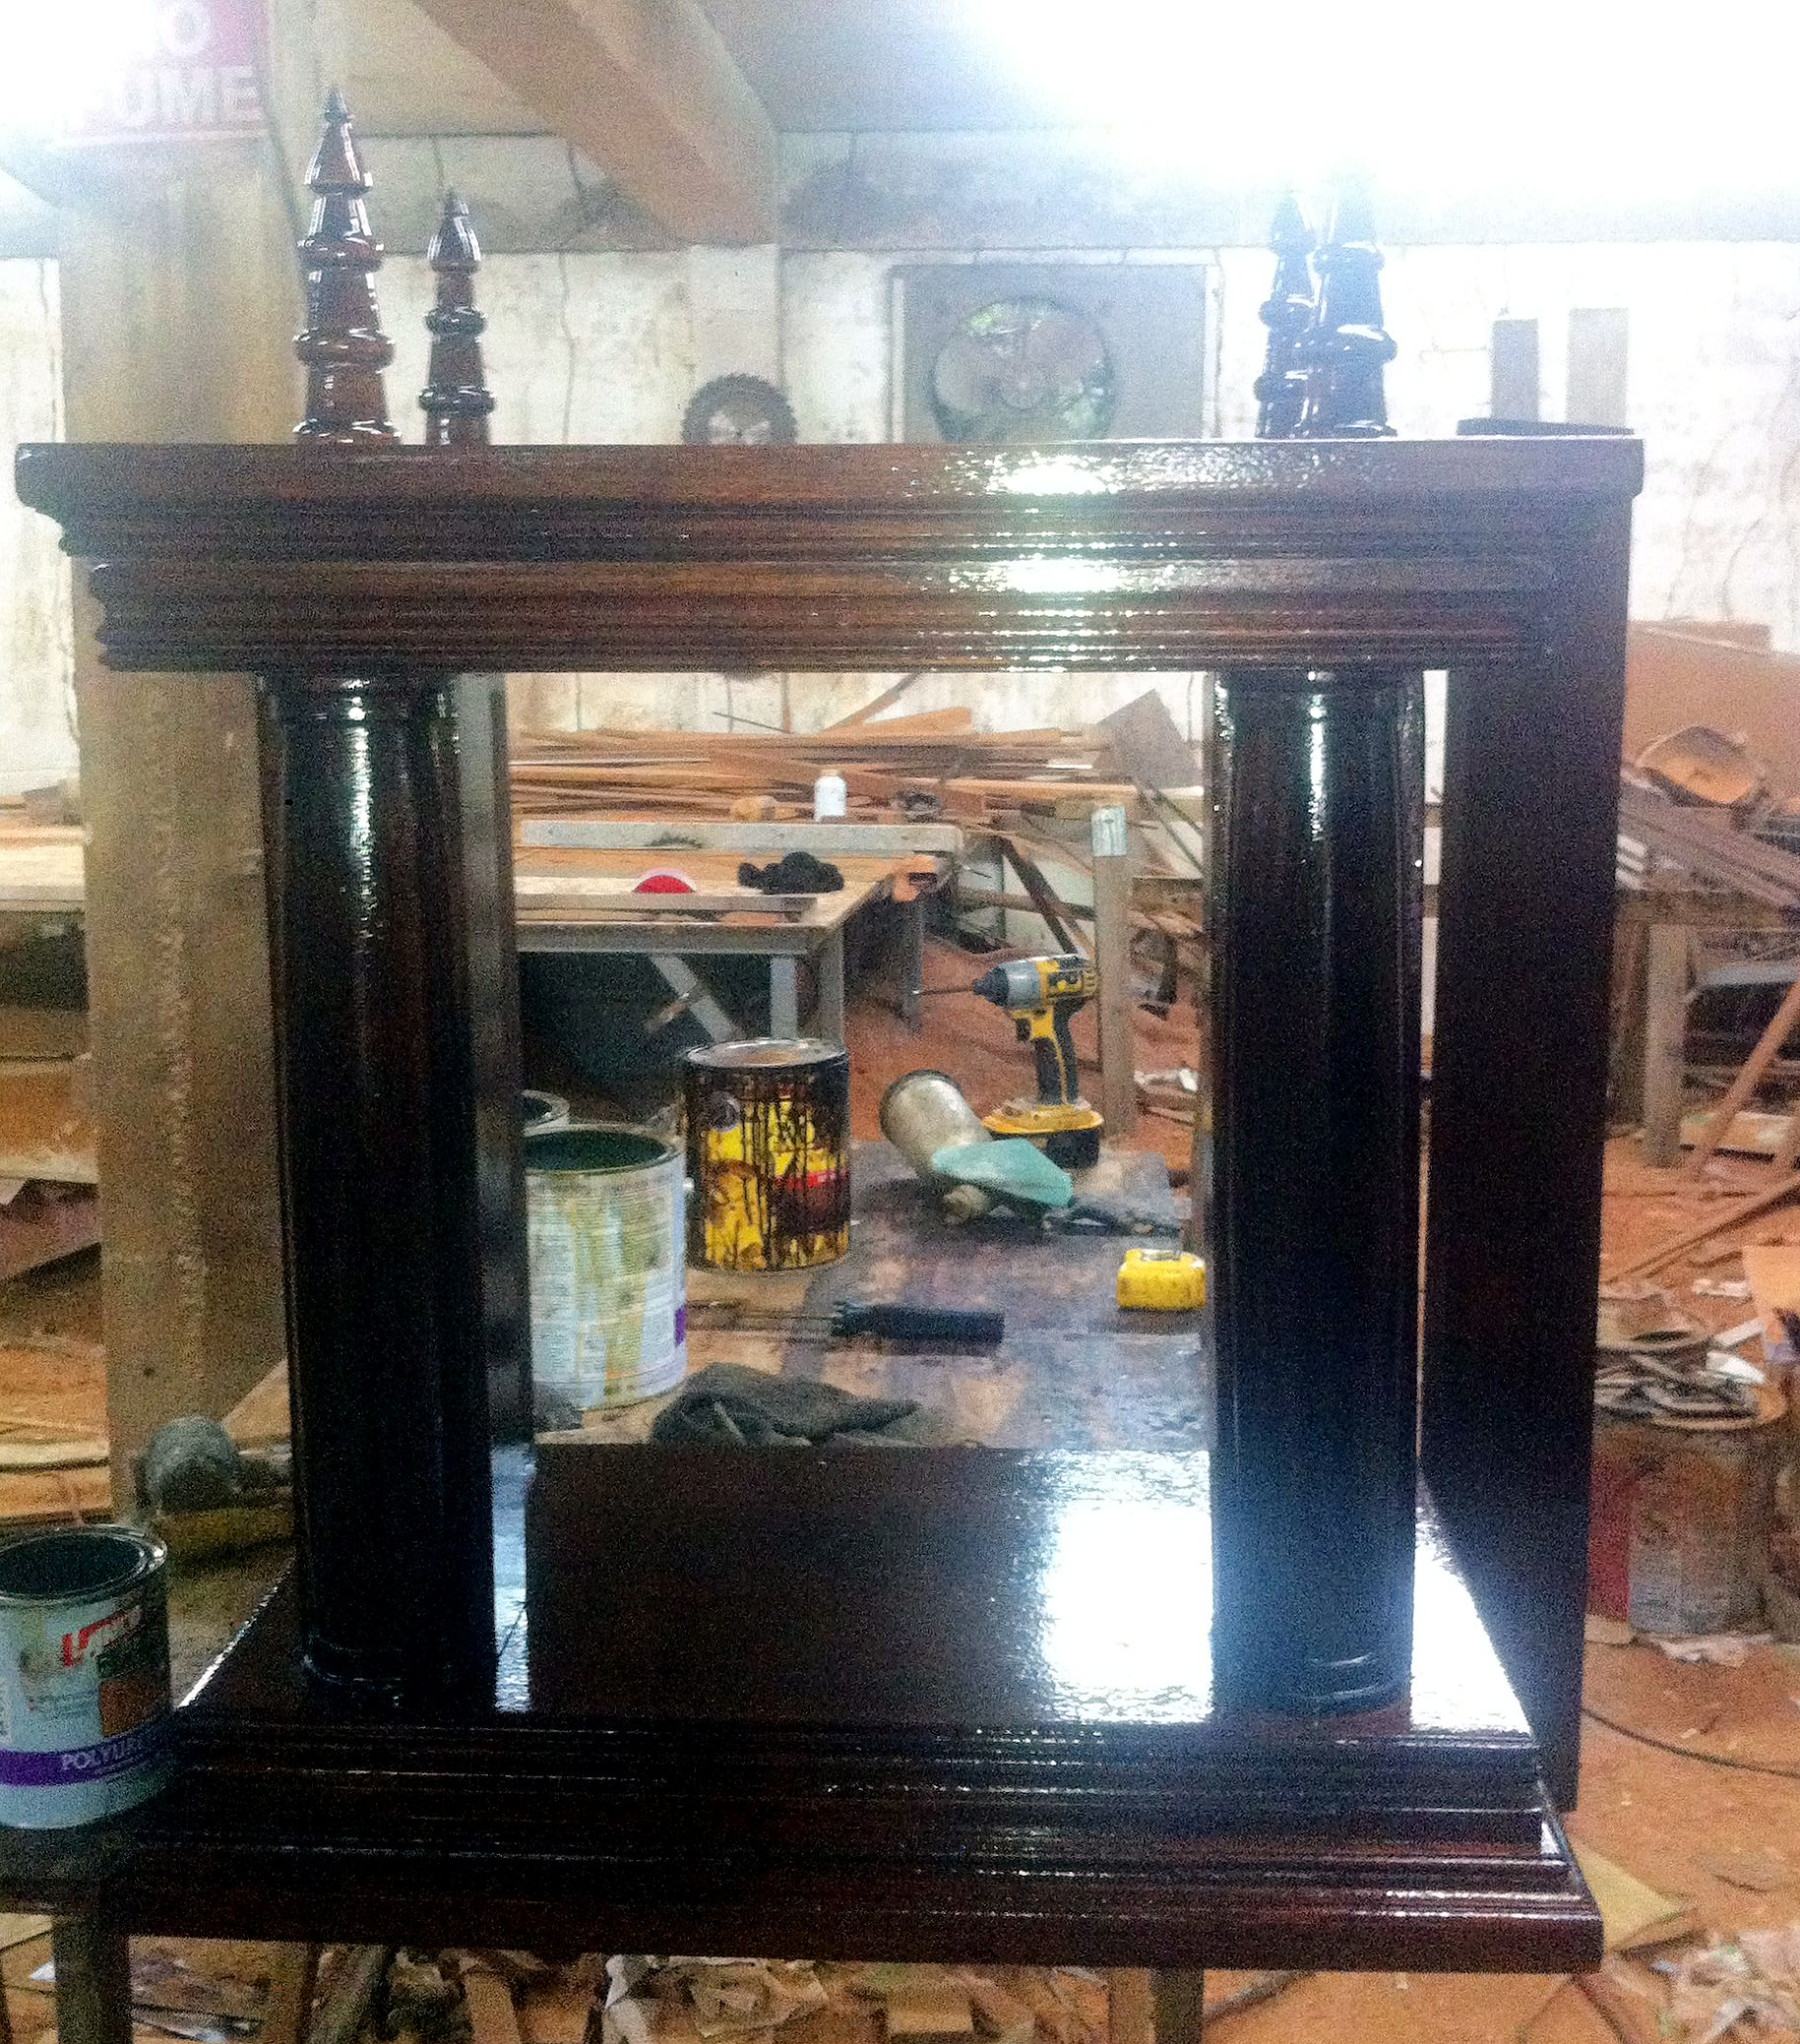 Andy artisan woodwork muebles en madera solida para for Artisan muebles